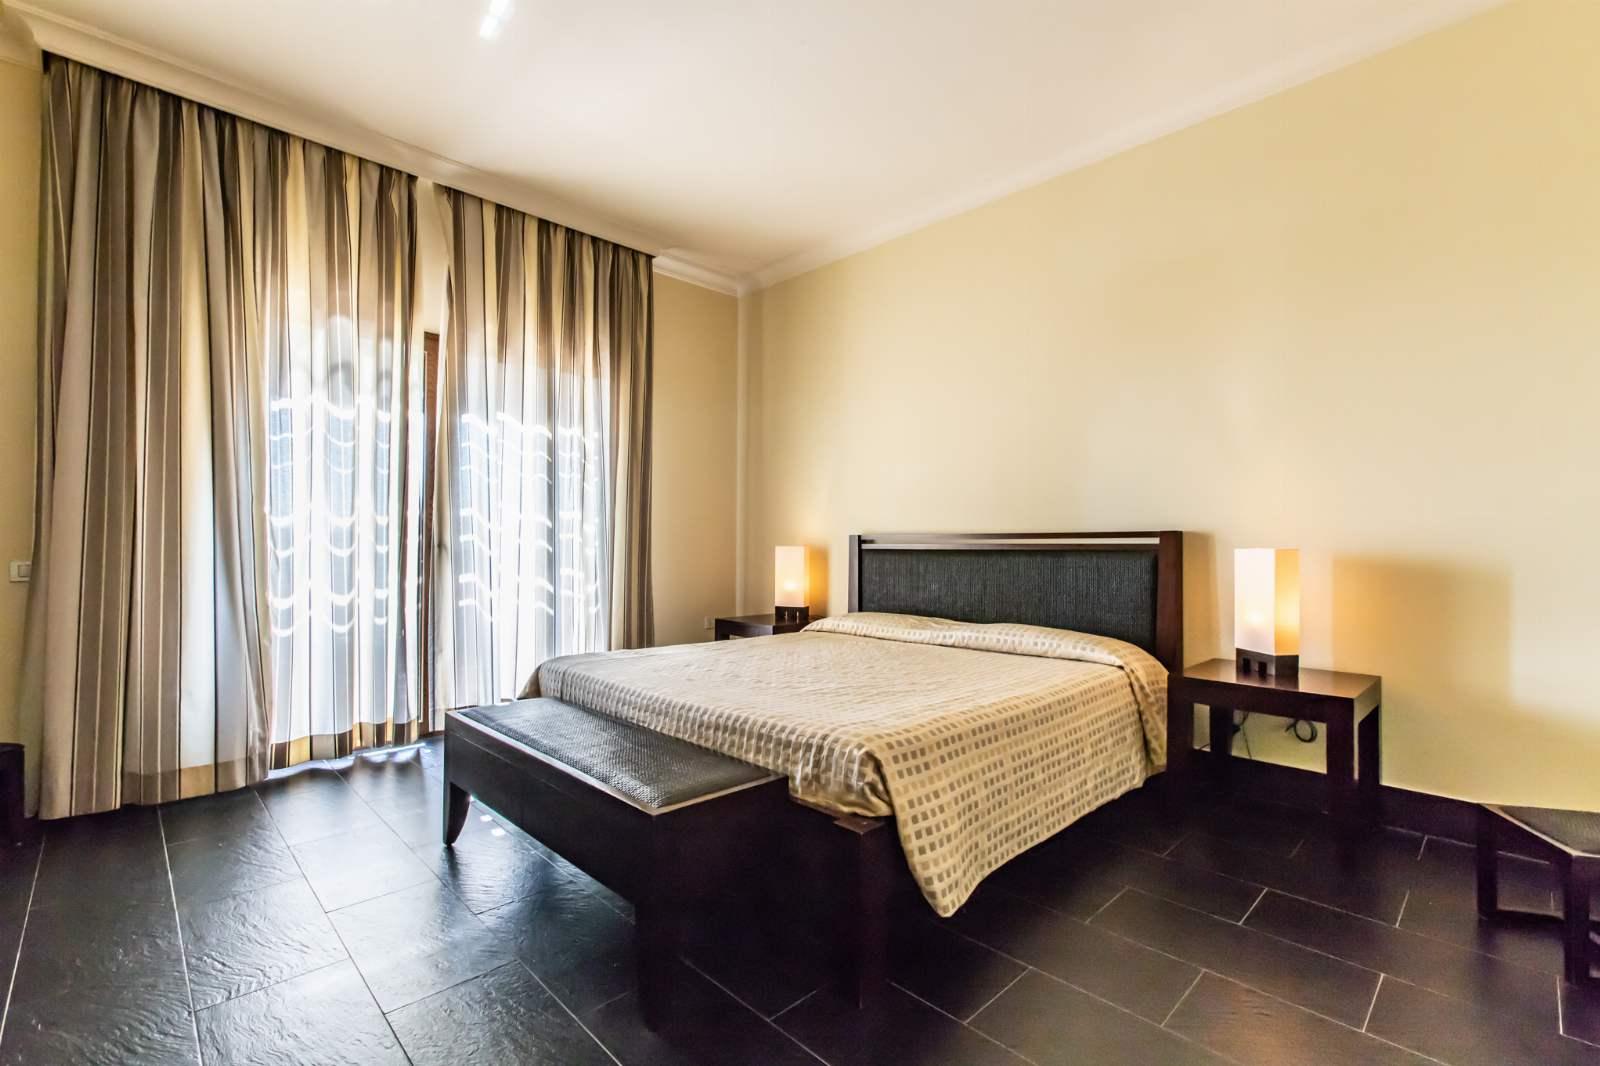 Falconara Resort & Spa: room / property / locale photo. Image 5